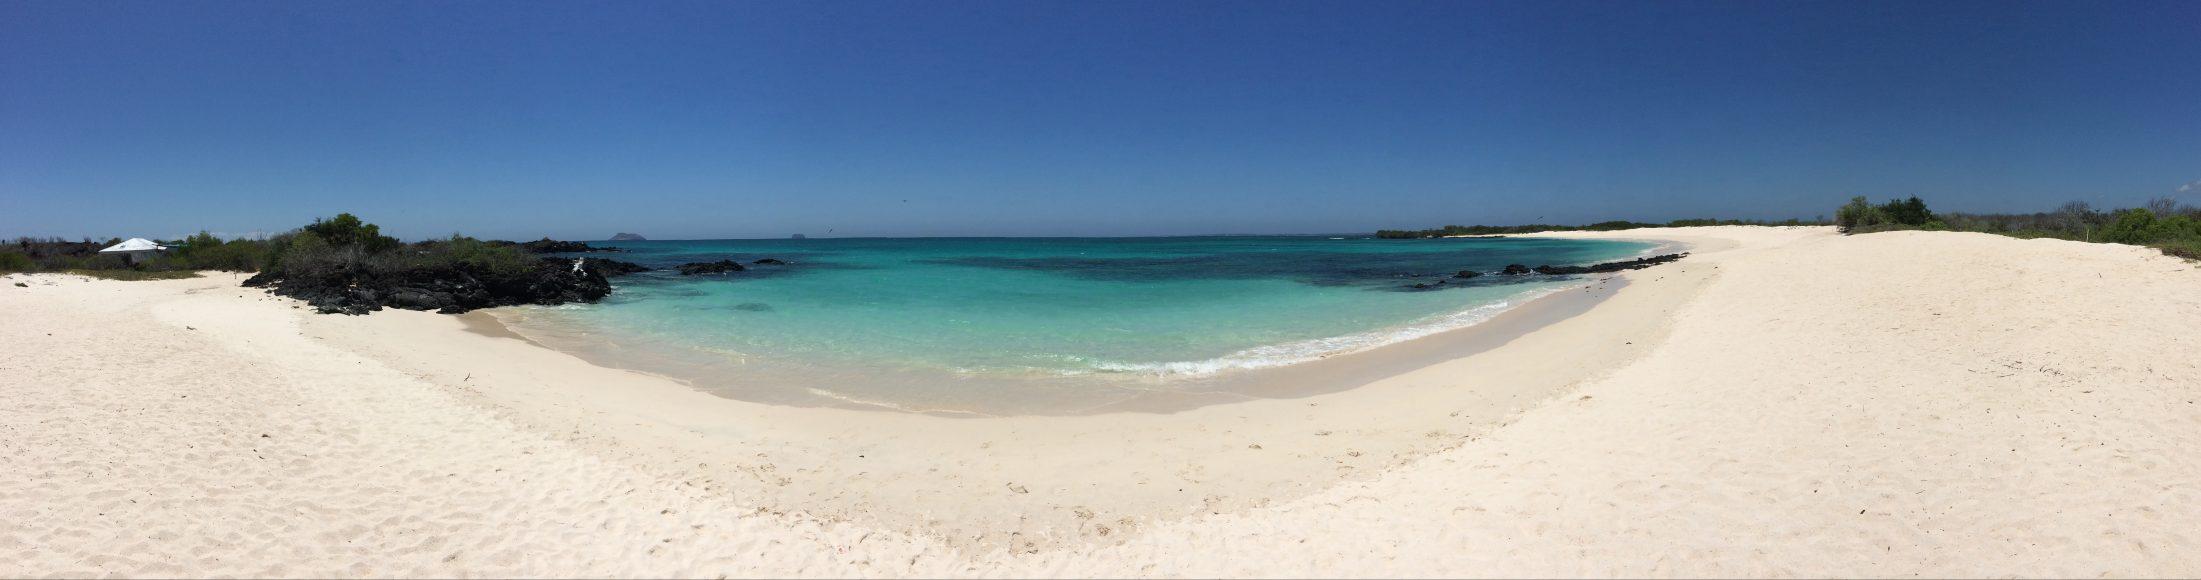 North Santa Cruz beach on the Galápagos Islands